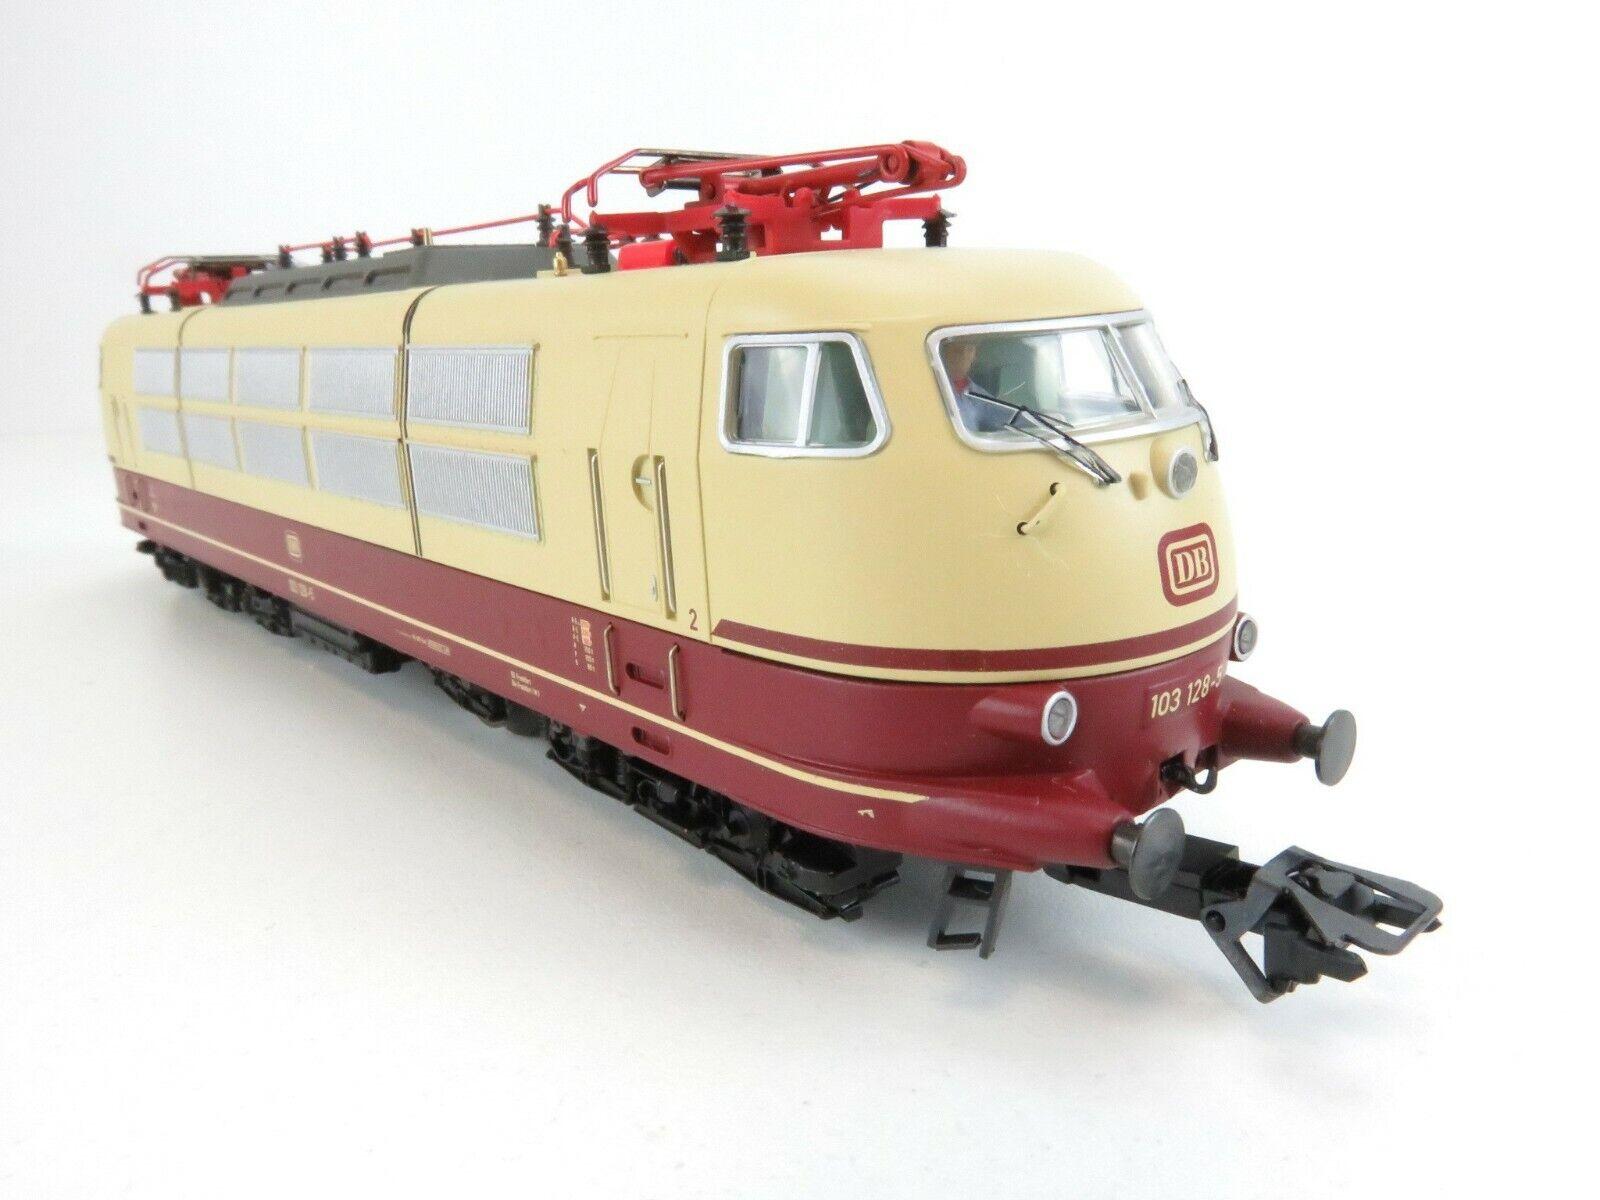 Locomotora eléctrica 37577 clase DB 103.1